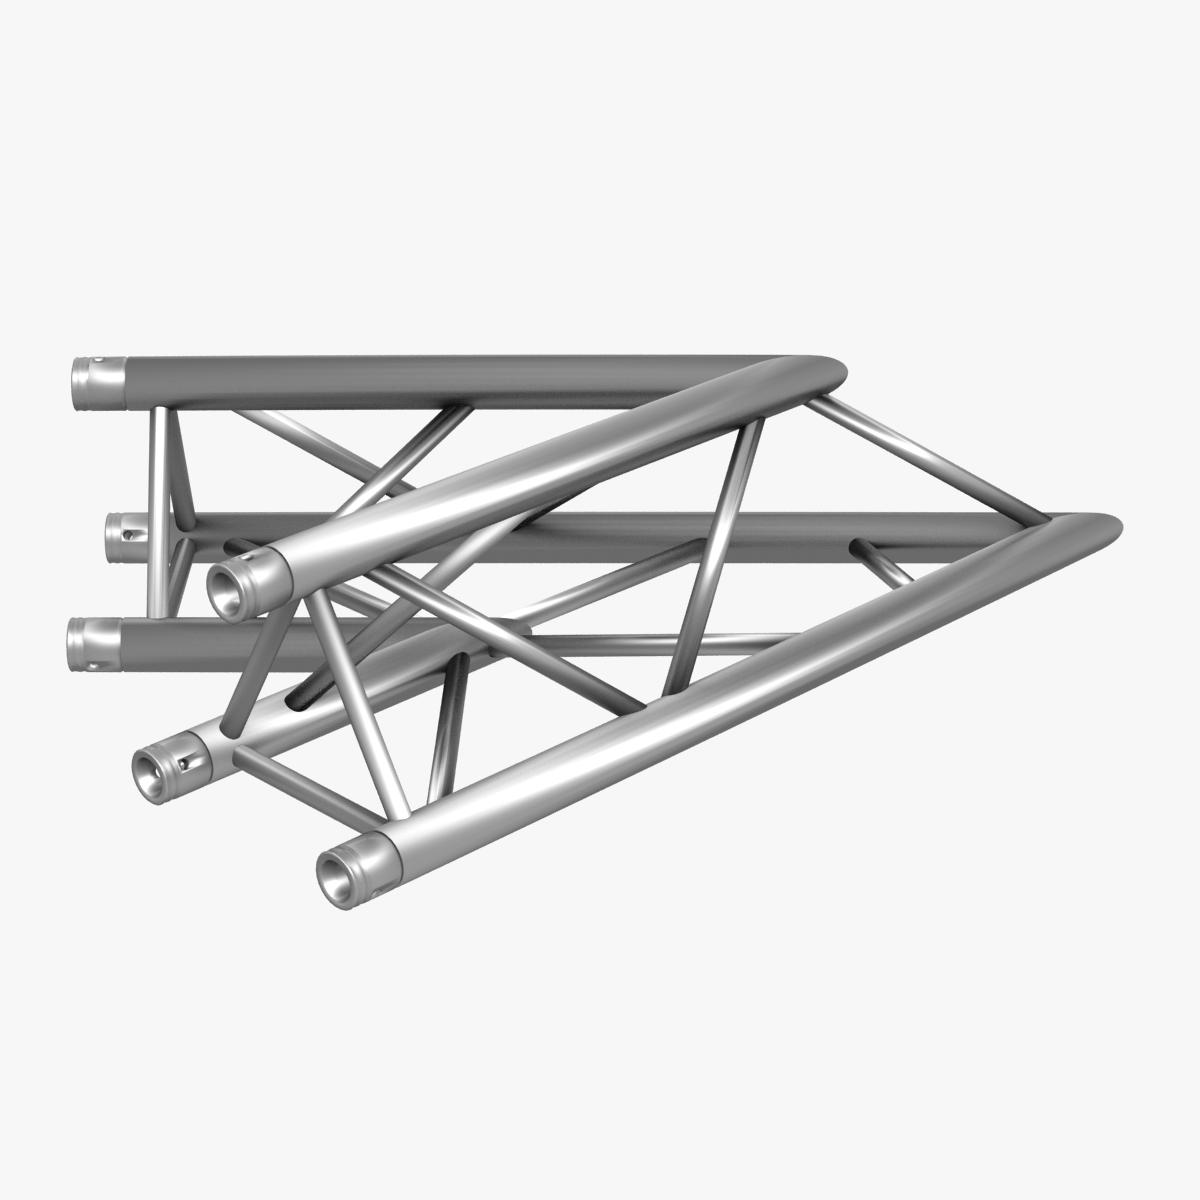 triangular trusses (collection 55 modular pieces) 3d model 3ds max dxf fbx c4d dae texture obj 216232